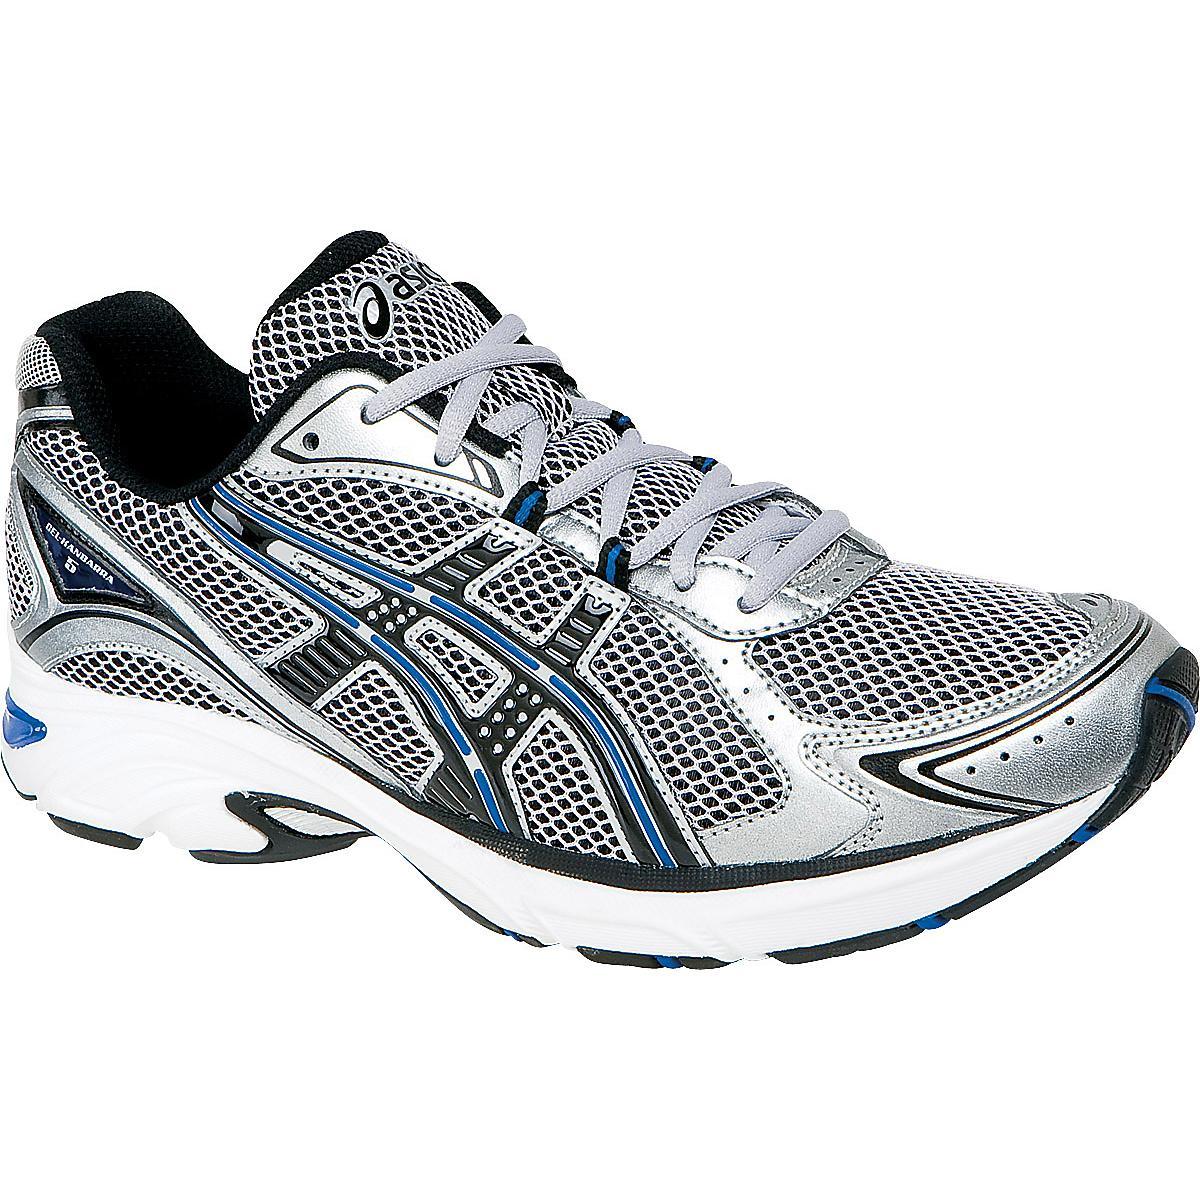 e3db3e91999 Mens ASICS GEL-Kanbarra 5 Running Shoe at Road Runner Sports